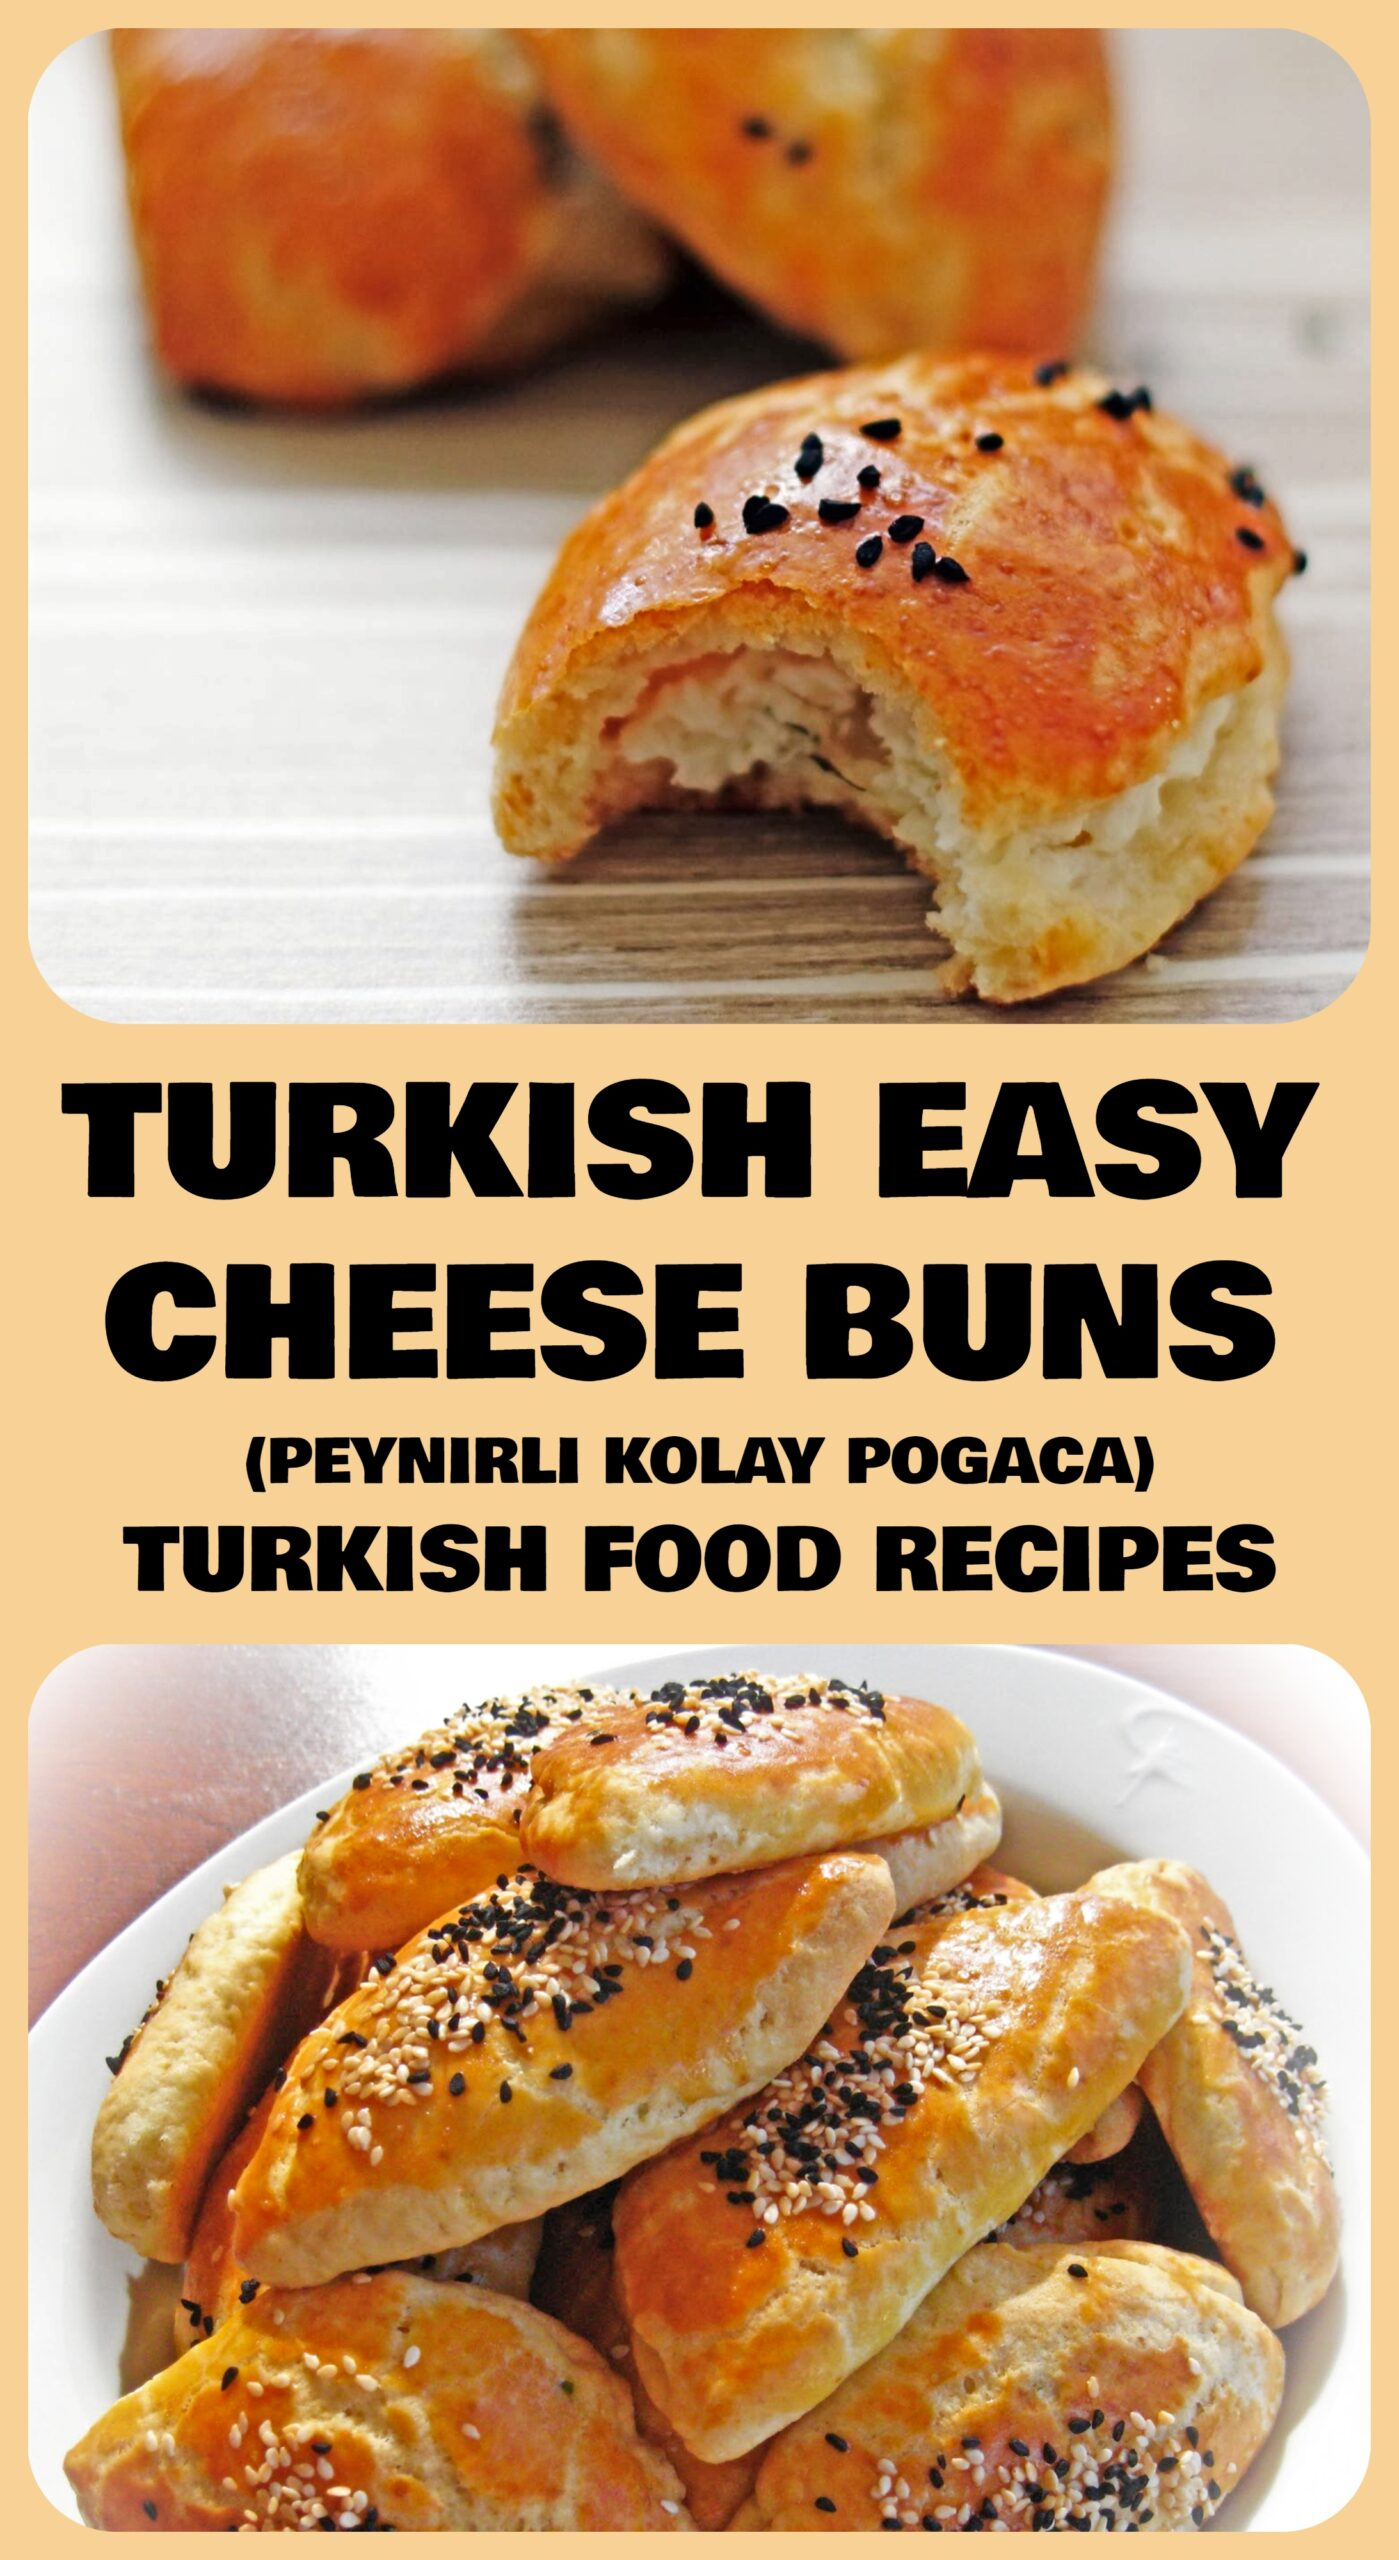 Turkish Easy Cheese Buns - Peynirli Kolay Pogaca Recipe